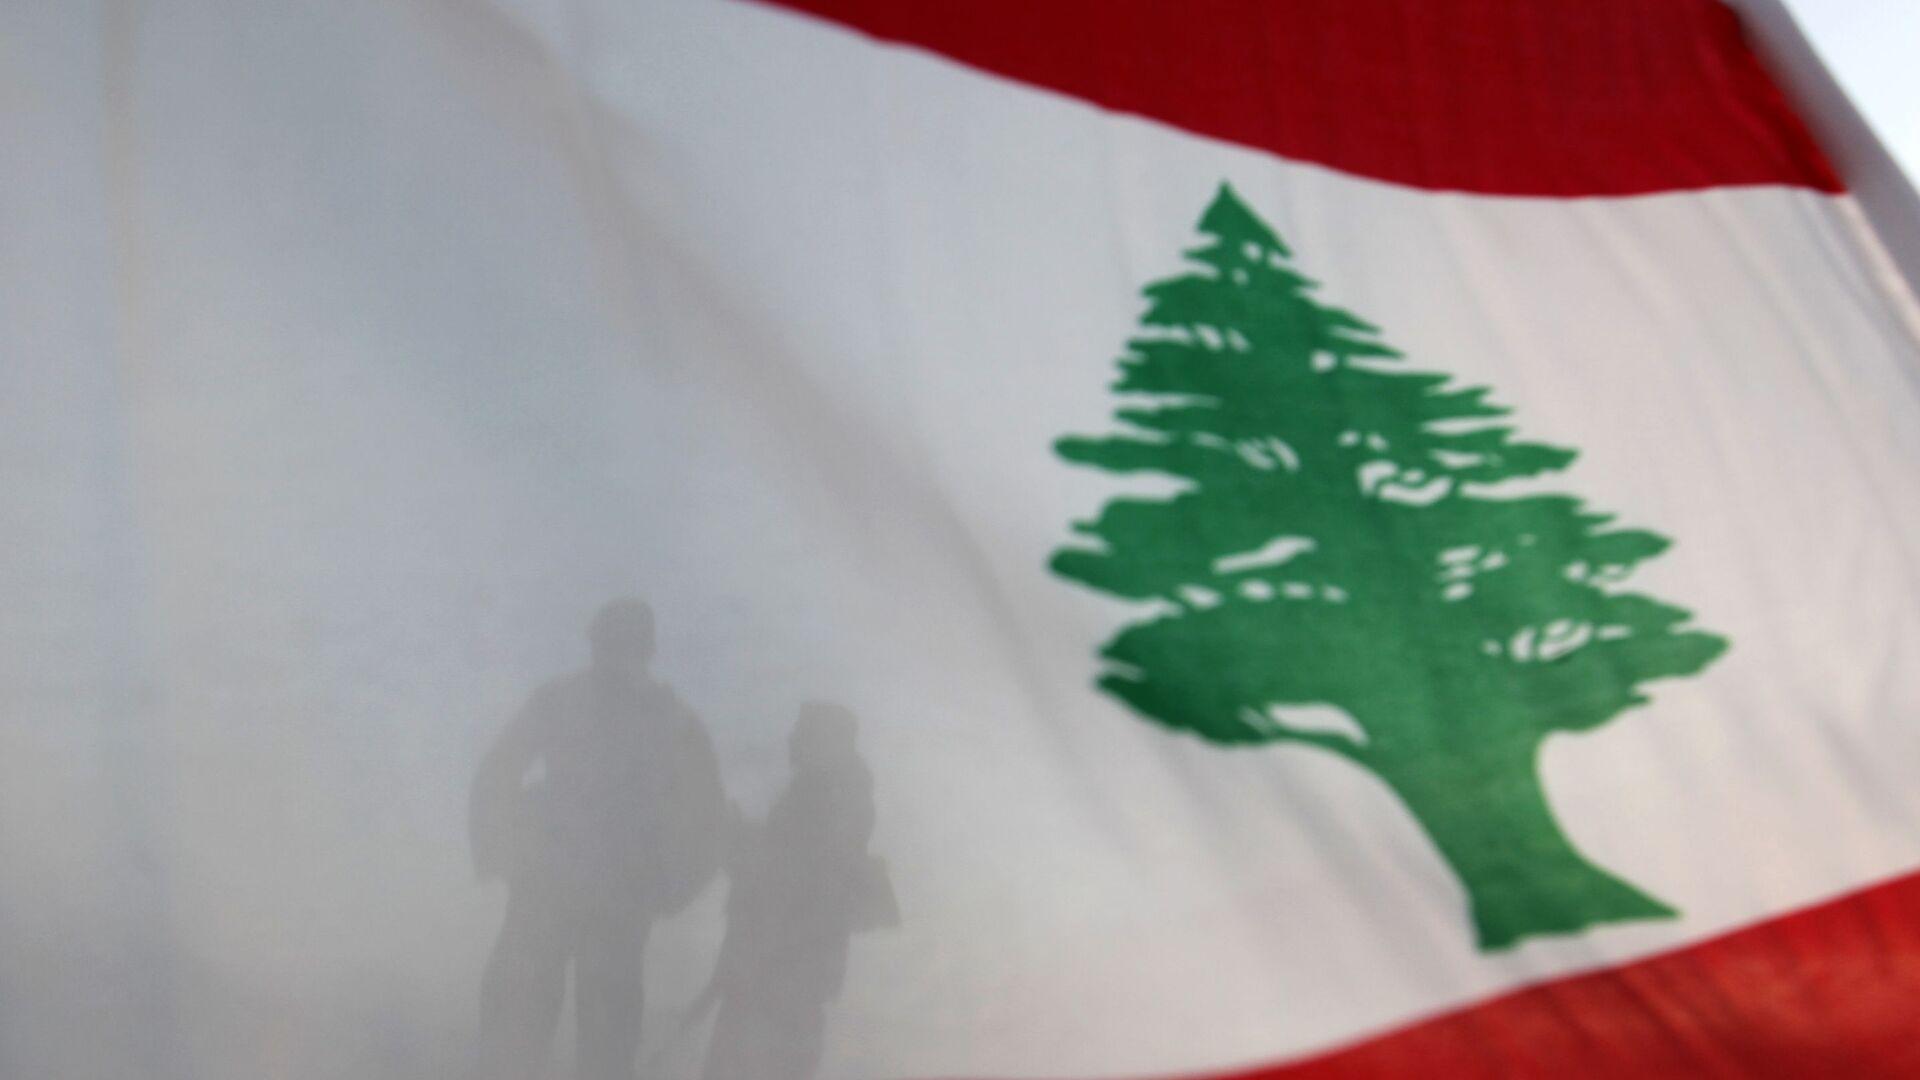 Bandera del Líbano - Sputnik Mundo, 1920, 19.06.2021